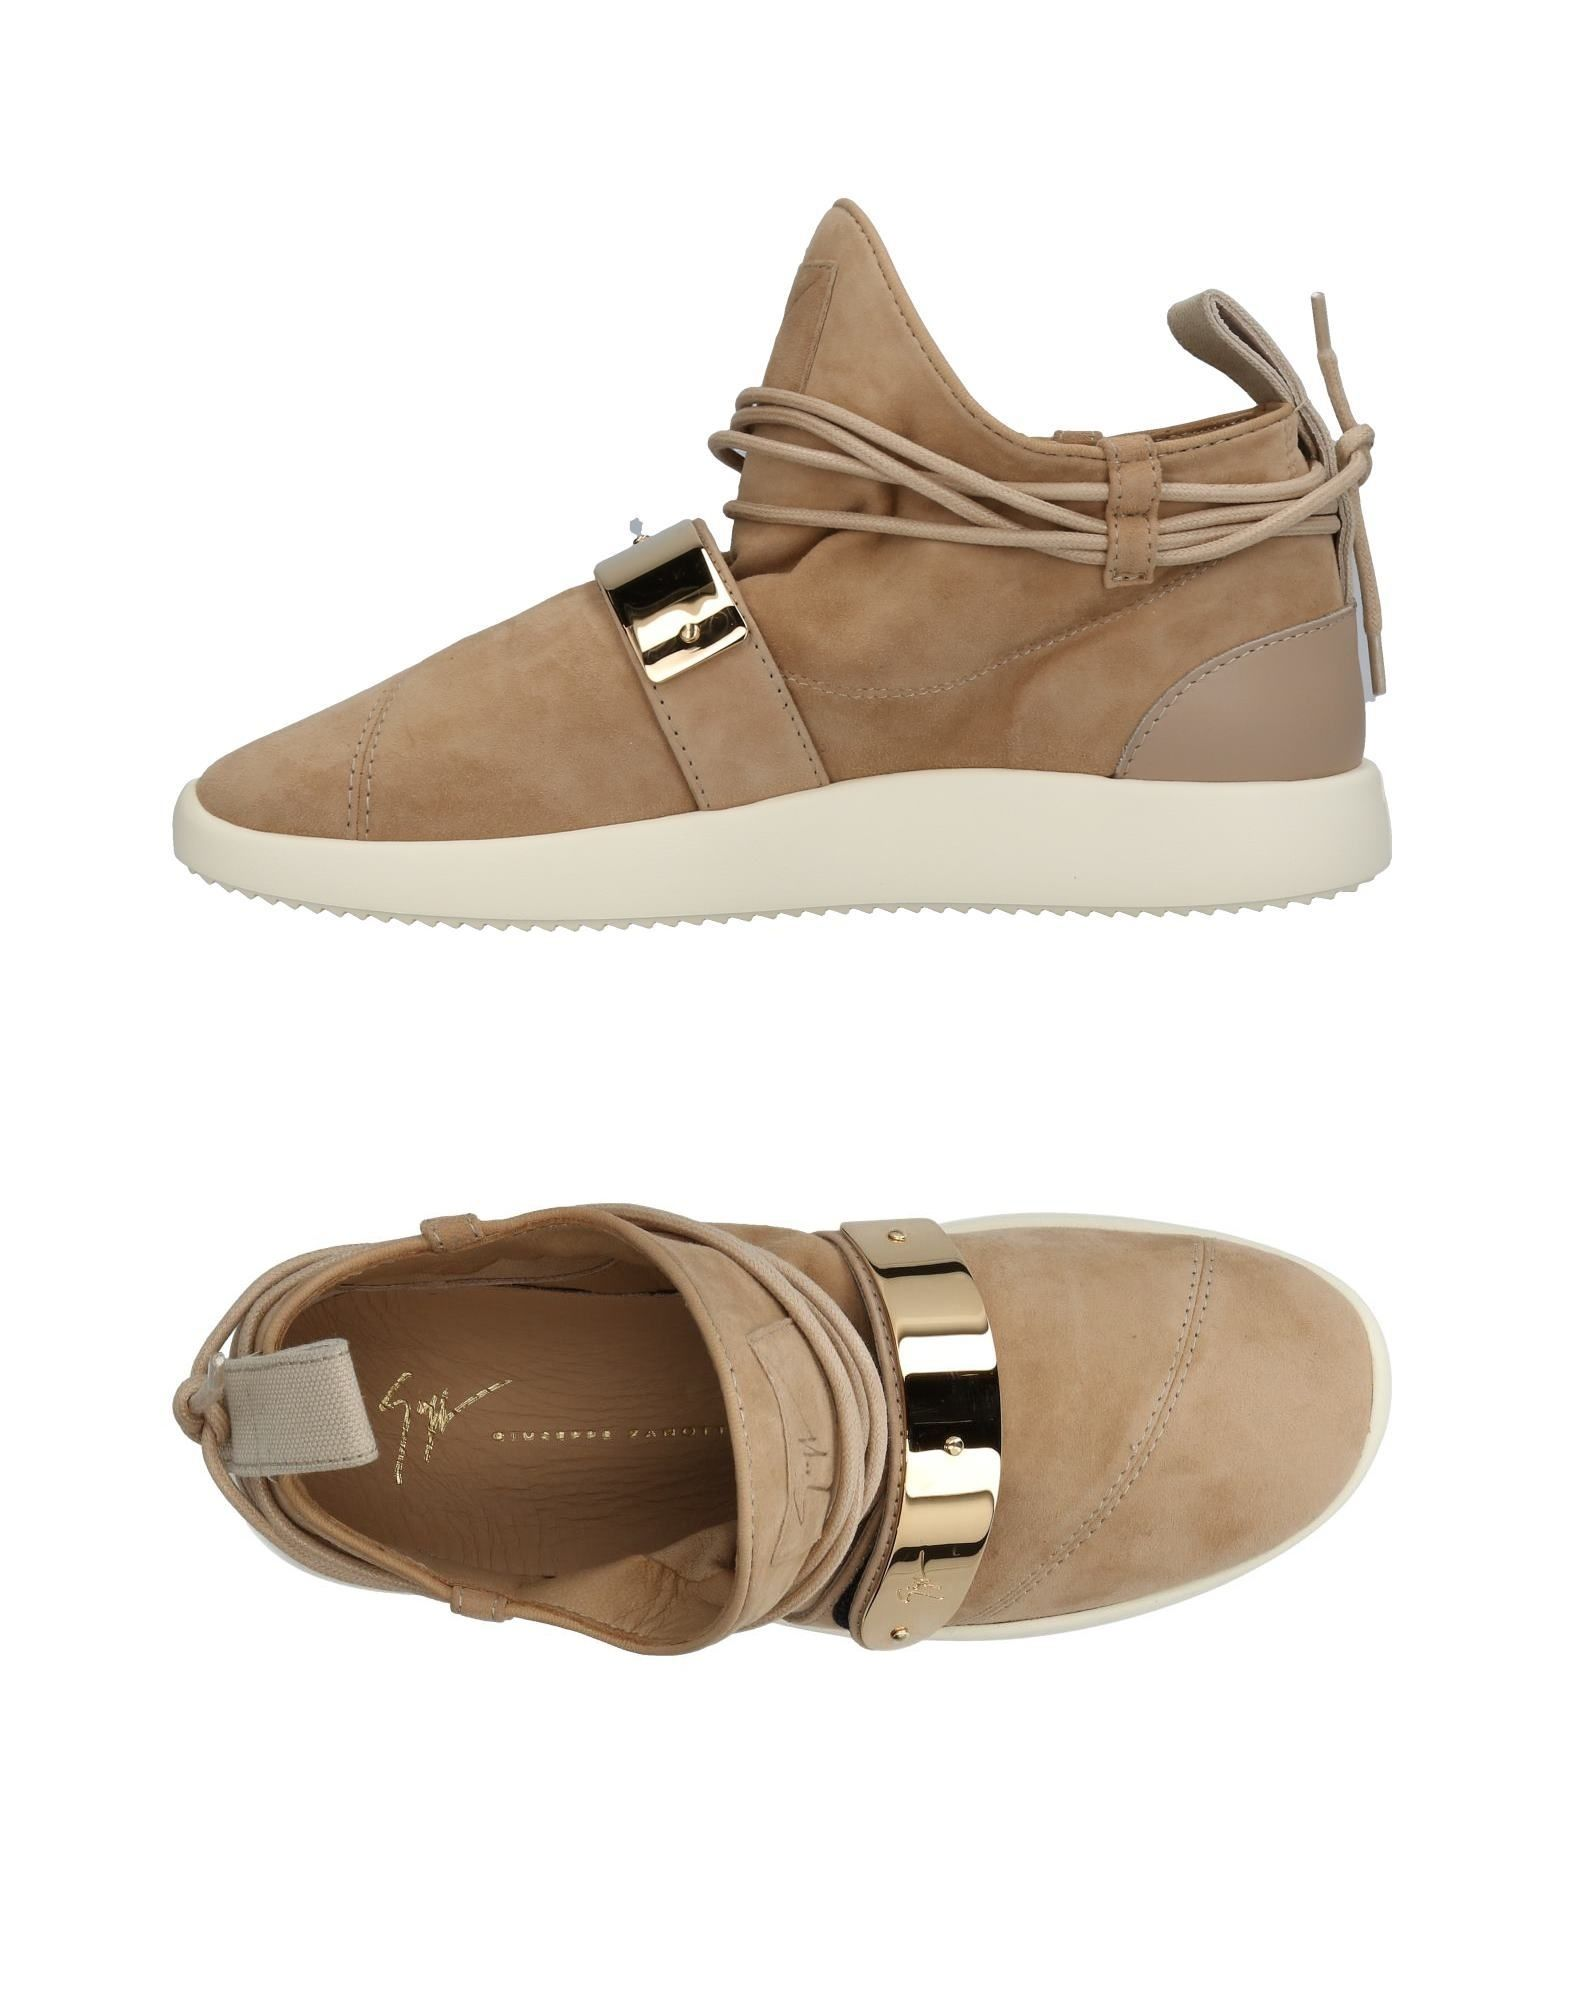 Giuseppe Zanotti Sneakers - Women Giuseppe Zanotti Sneakers - online on  Canada - Sneakers 11445877GV fa17be